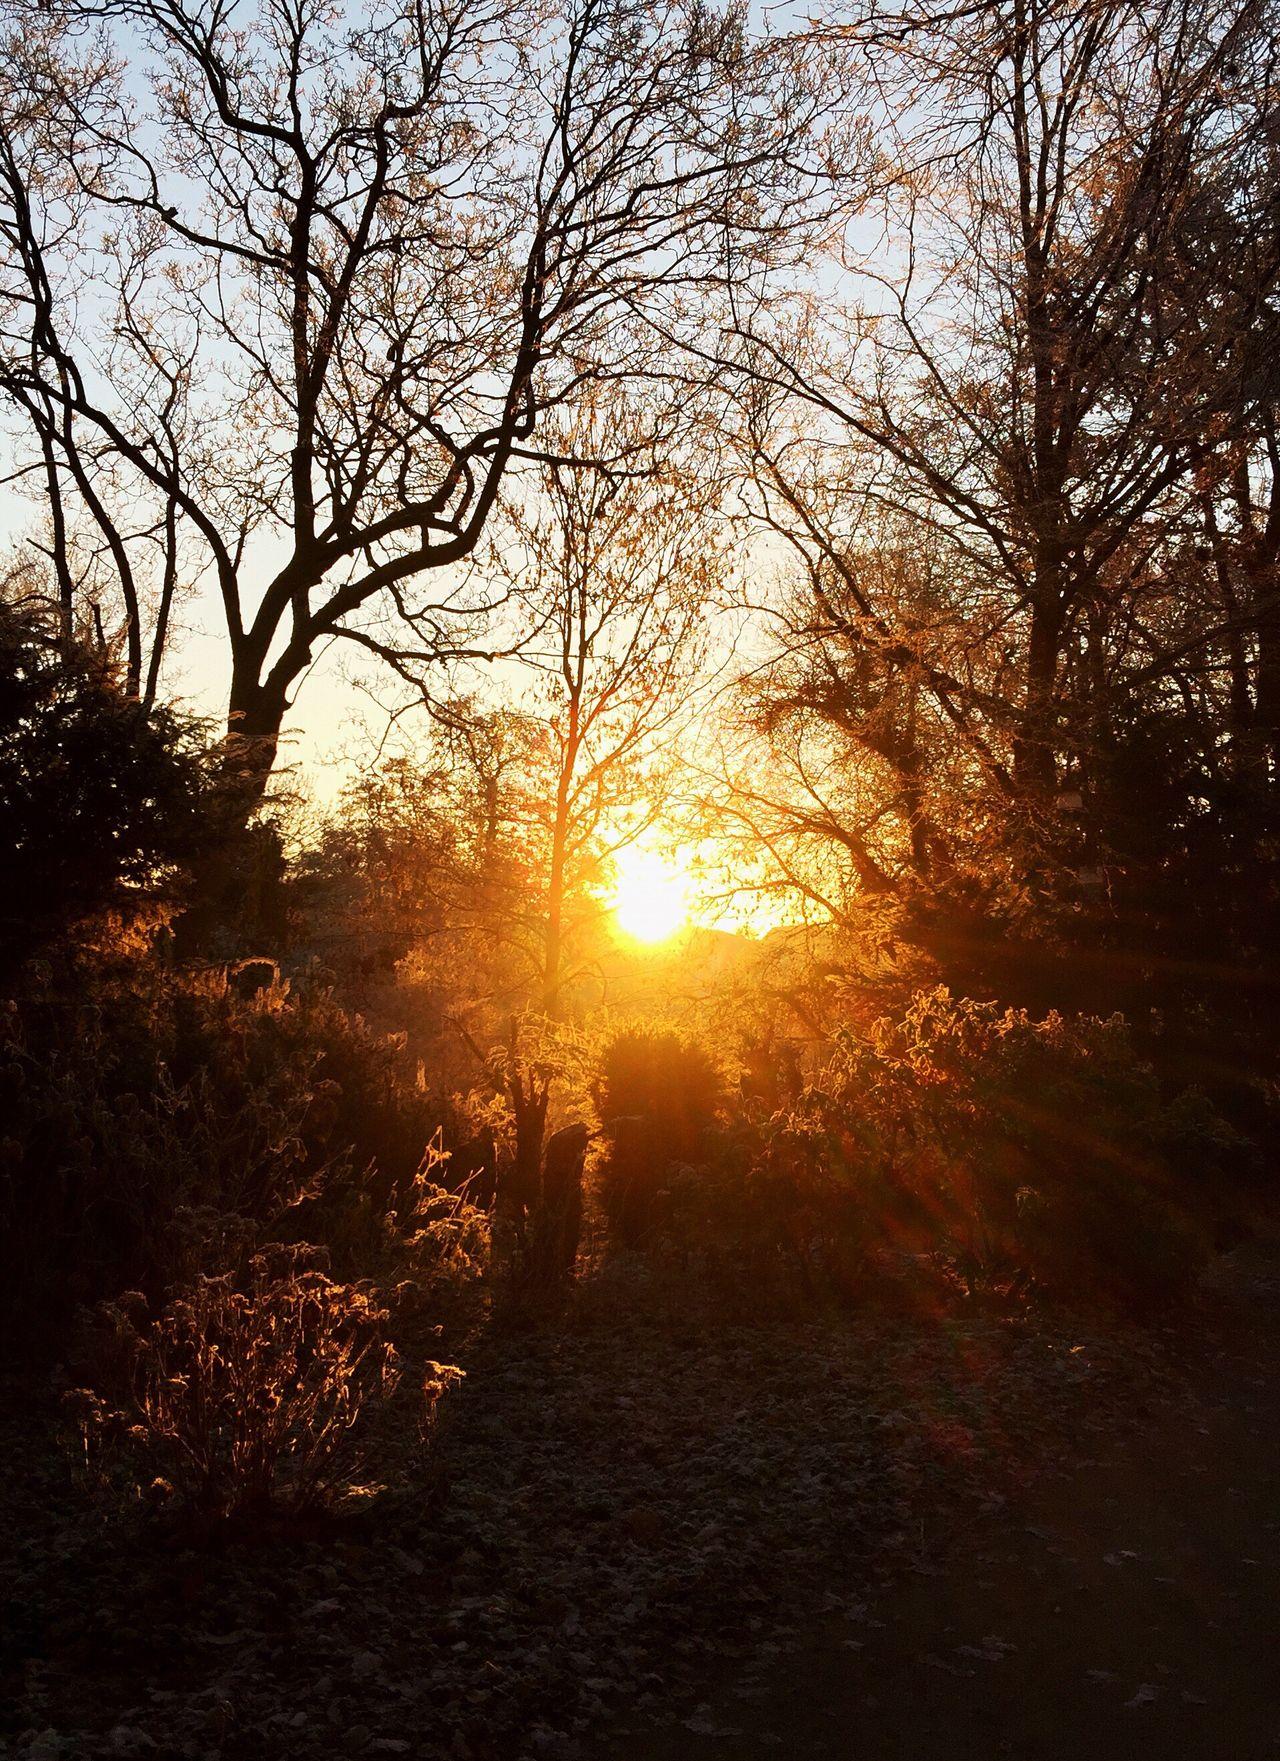 Nature Tree Sunset Sun Sunlight Beauty In Nature Scenics Tranquil Scene Sunbeam Tranquility Idyllic Landscape Non-urban Scene Outdoors Sky No People Bare Tree Day Sunrise Sonnenaufgang Bremen Am Wall Winterzeit Winter ❄